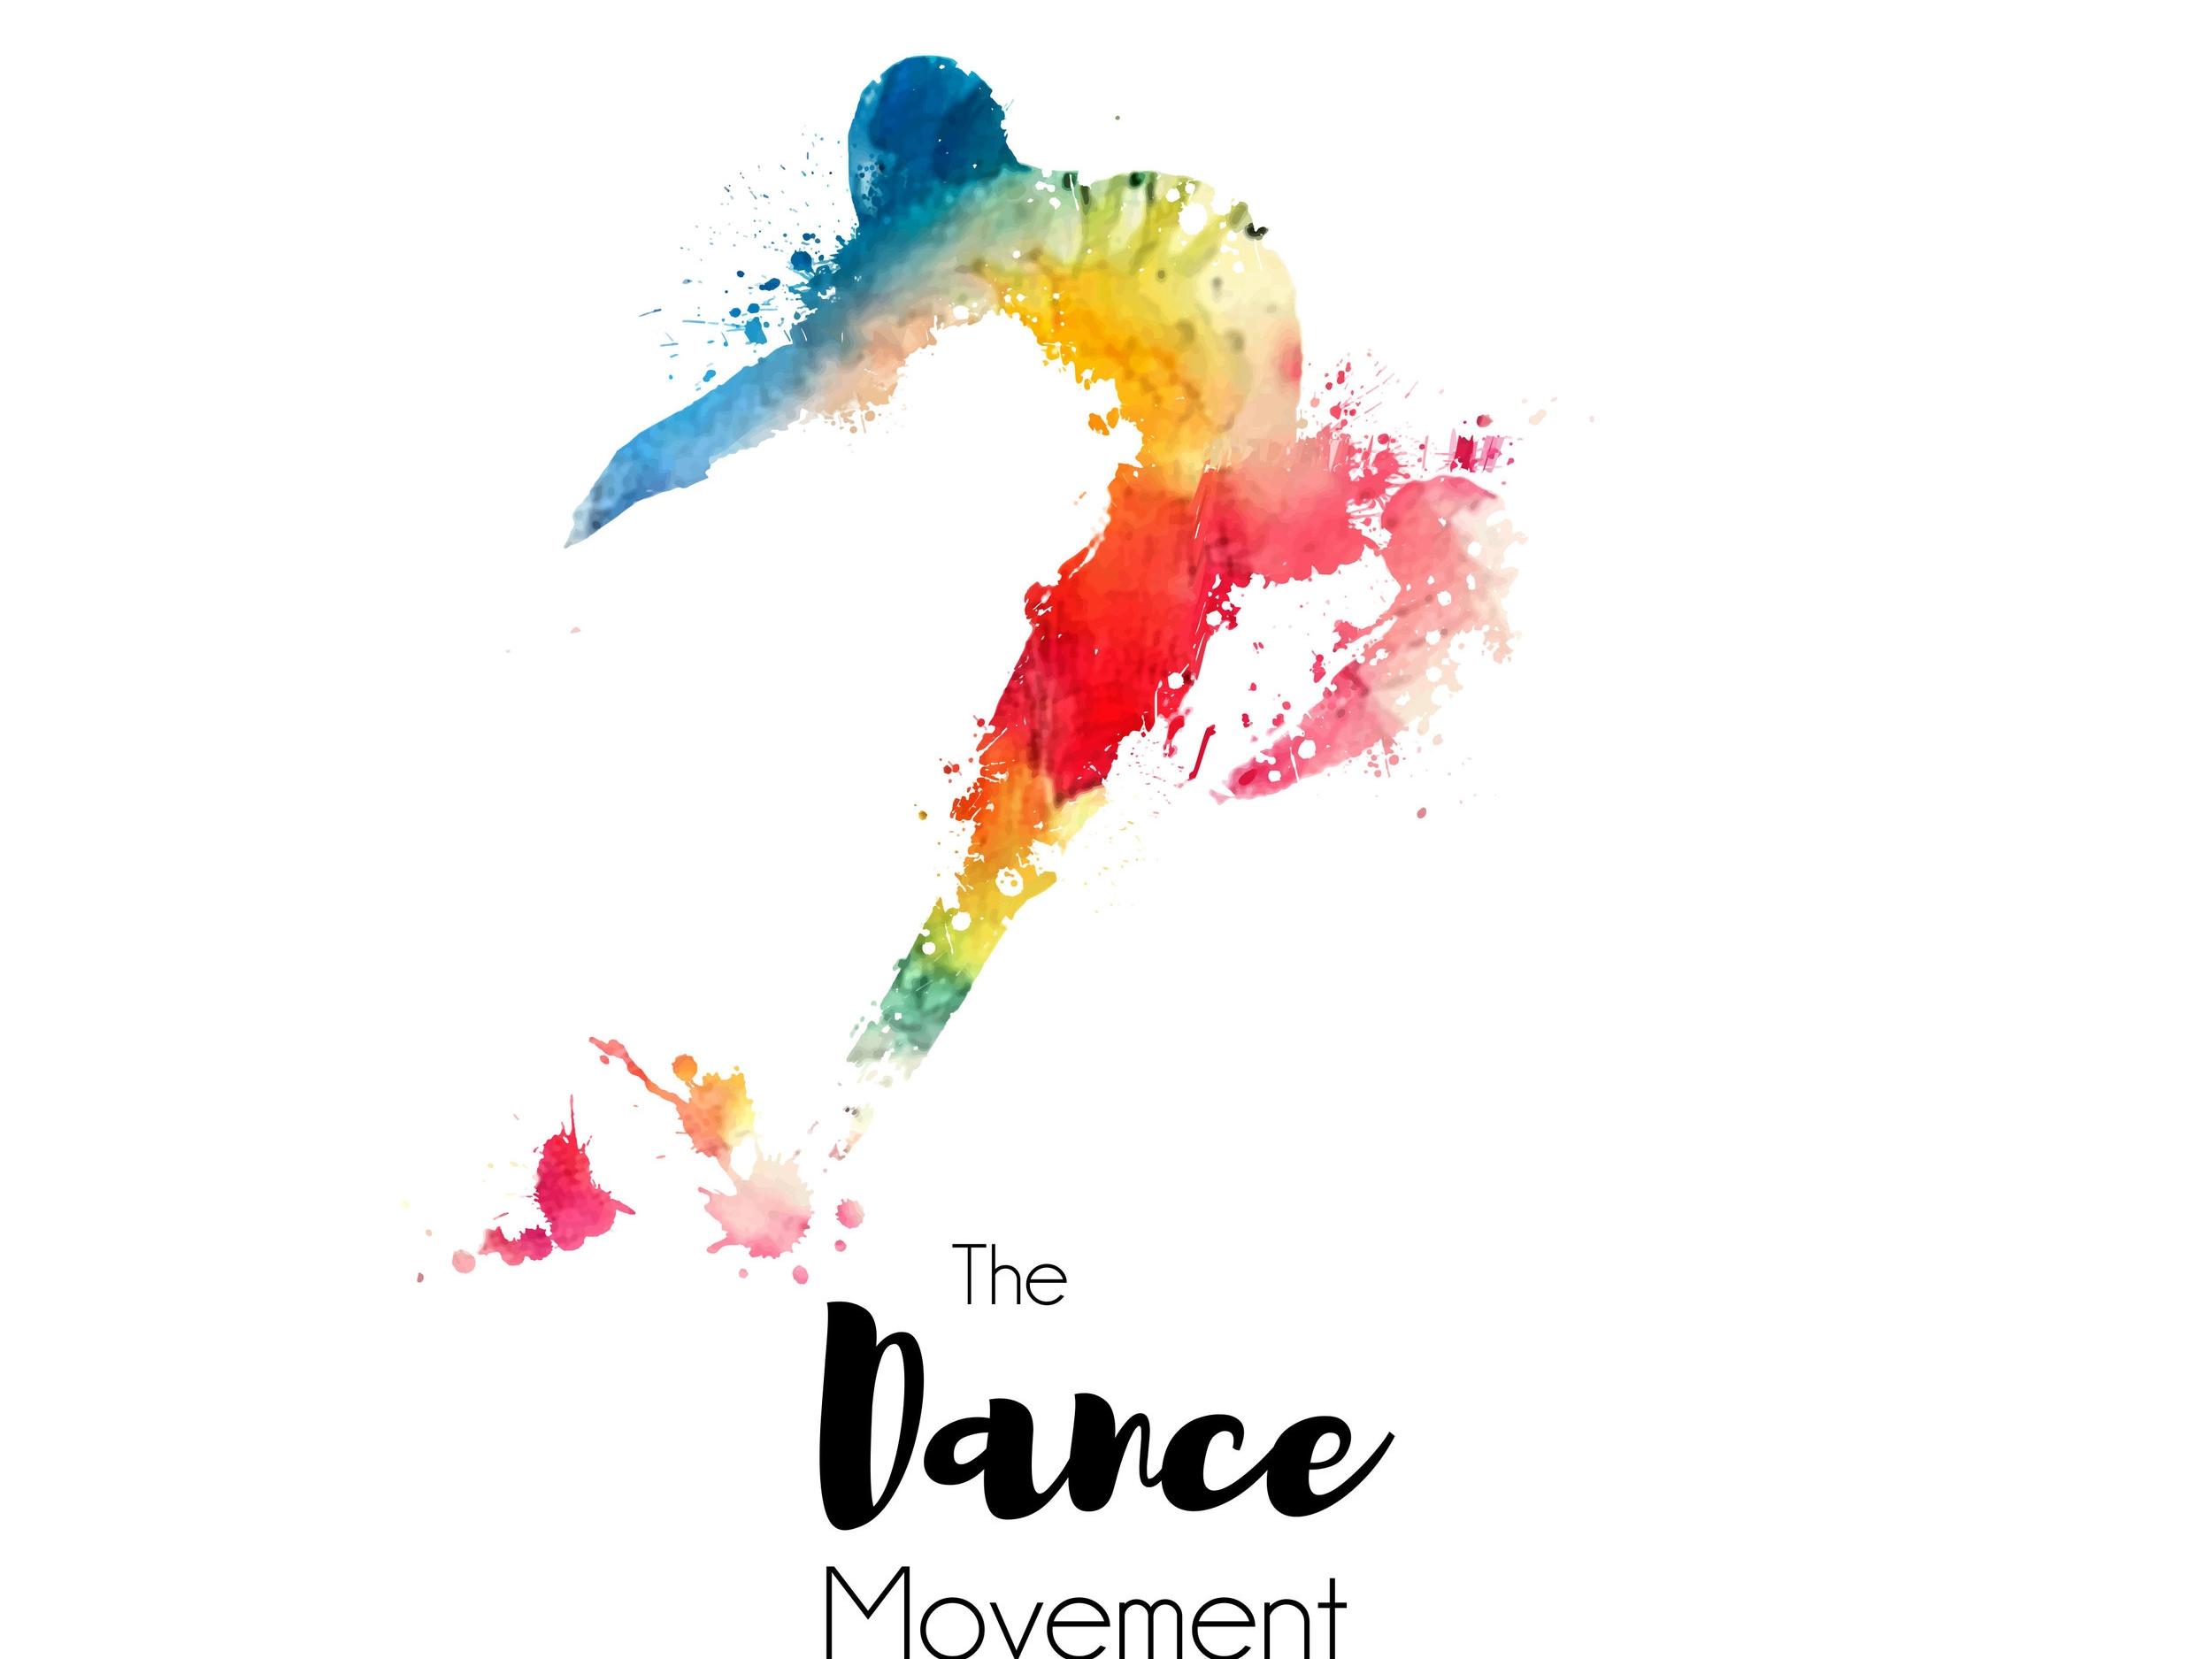 The Dance movement logo